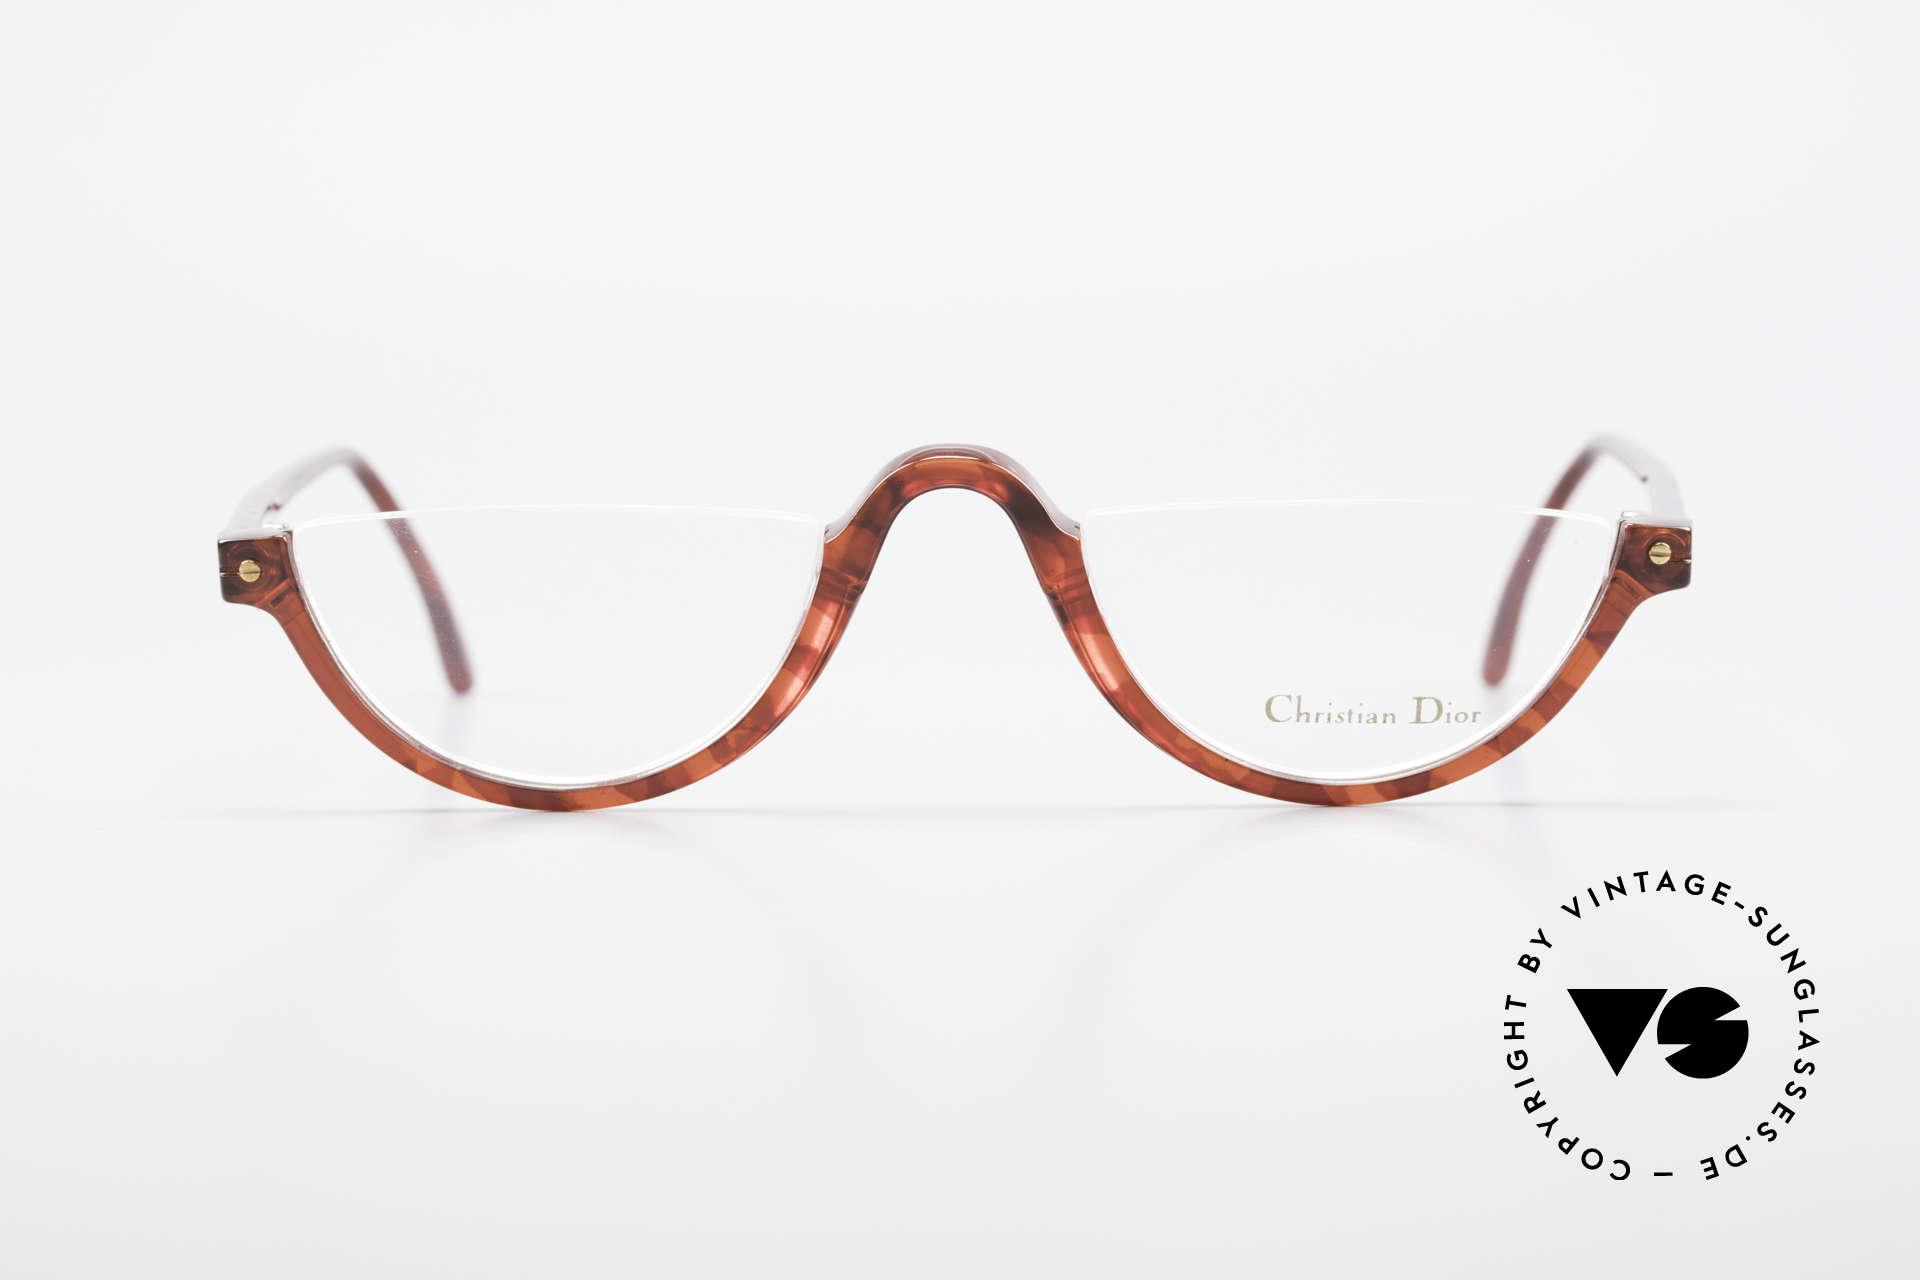 Christian Dior 2586 Reading Glasses Unisex 90's, lightweight half-frame design; ergonomically correct, Made for Men and Women